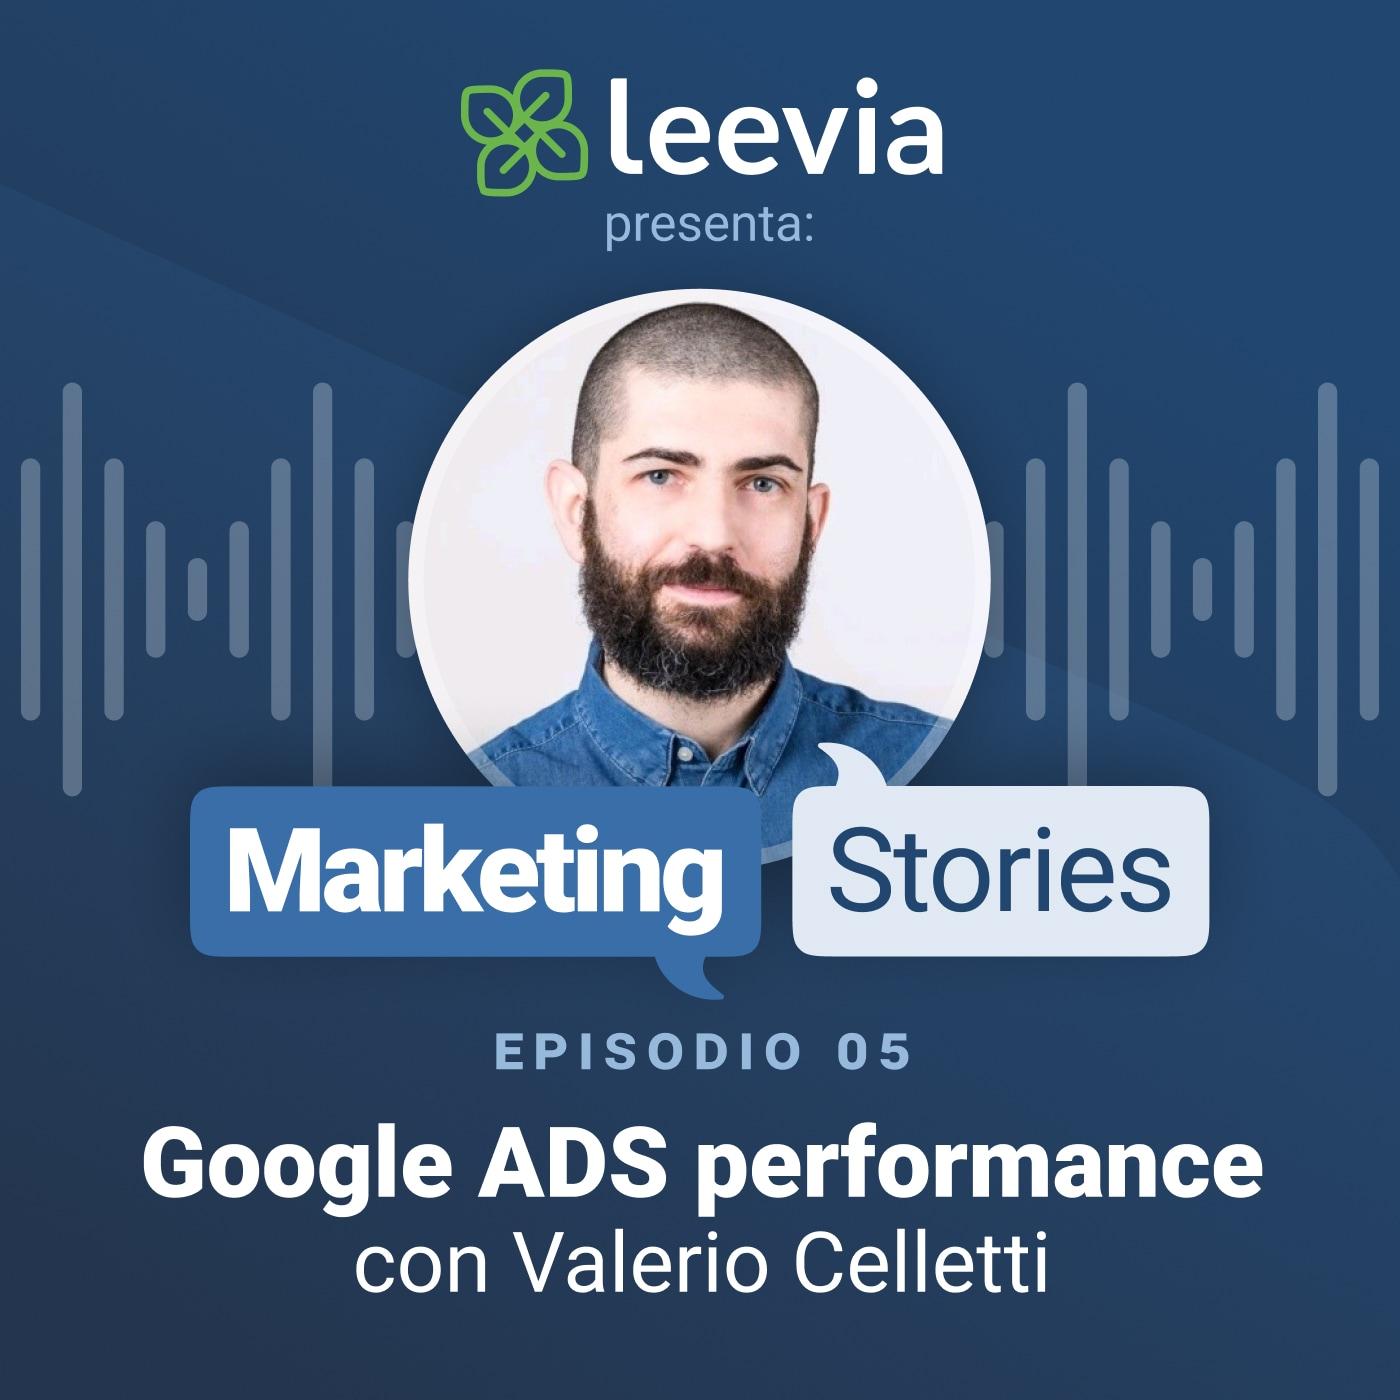 Google Ads Performance - Leevia Marketing Stories #05